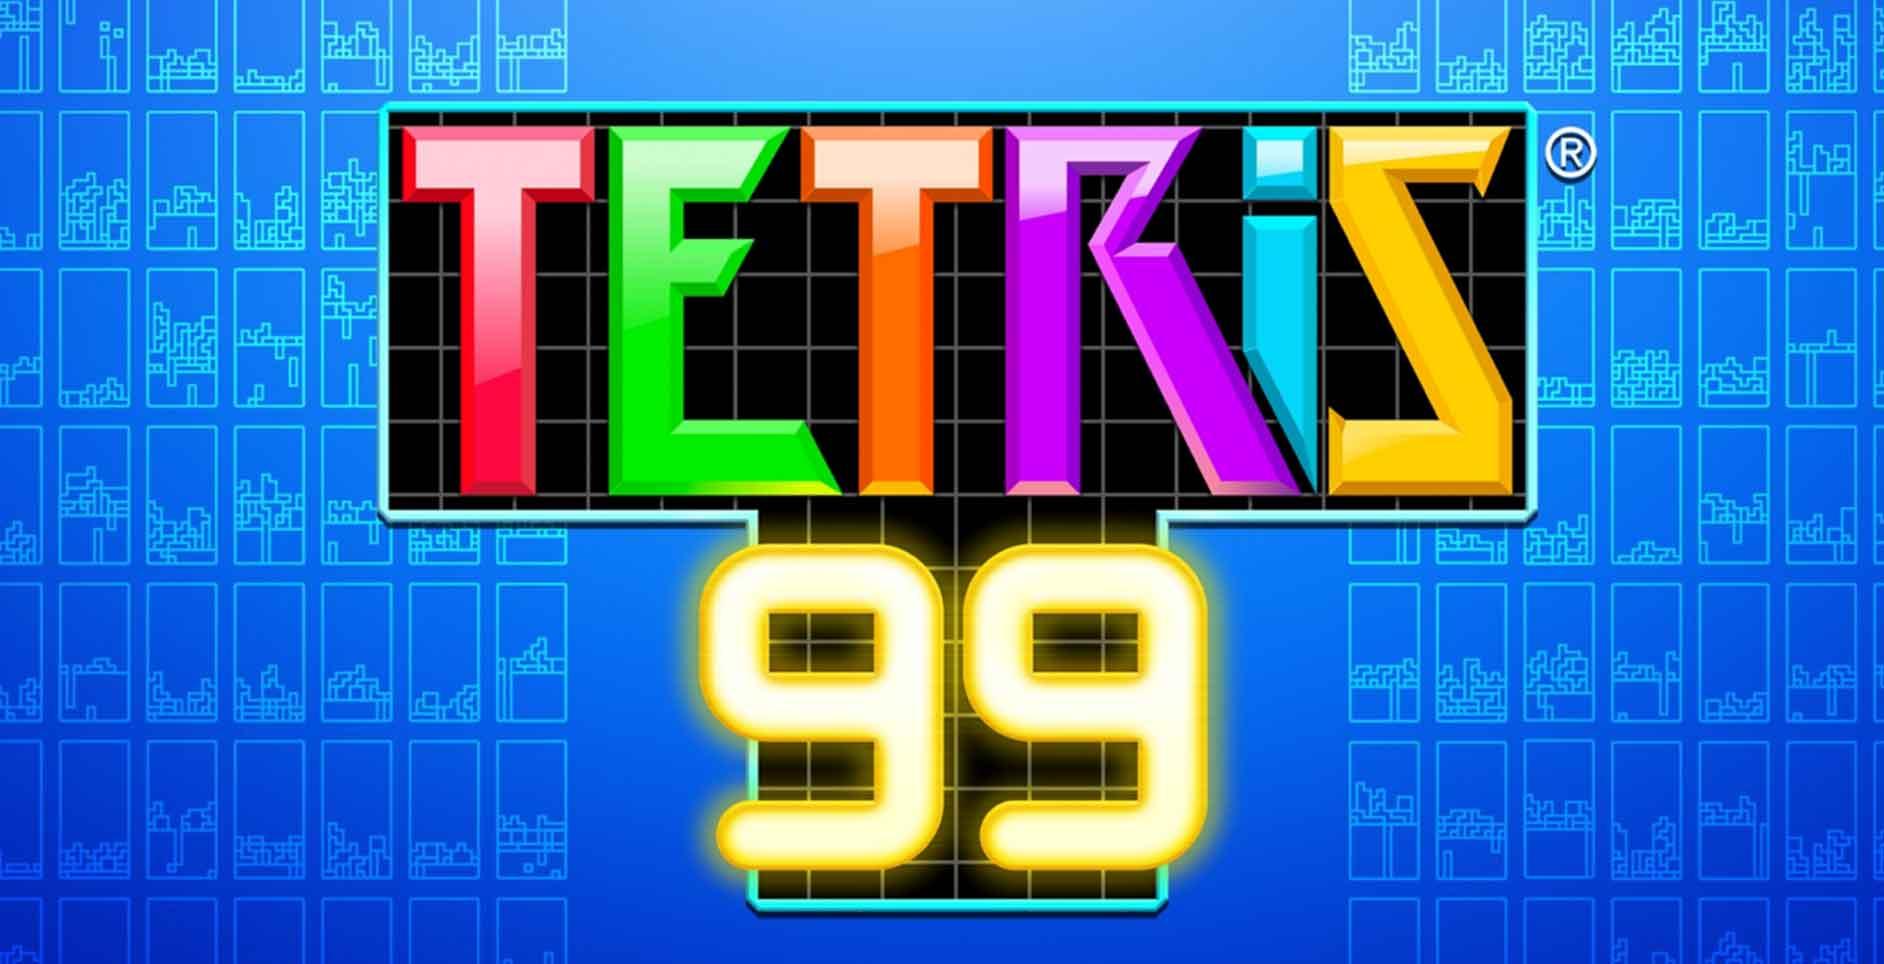 tetris 99, t spin